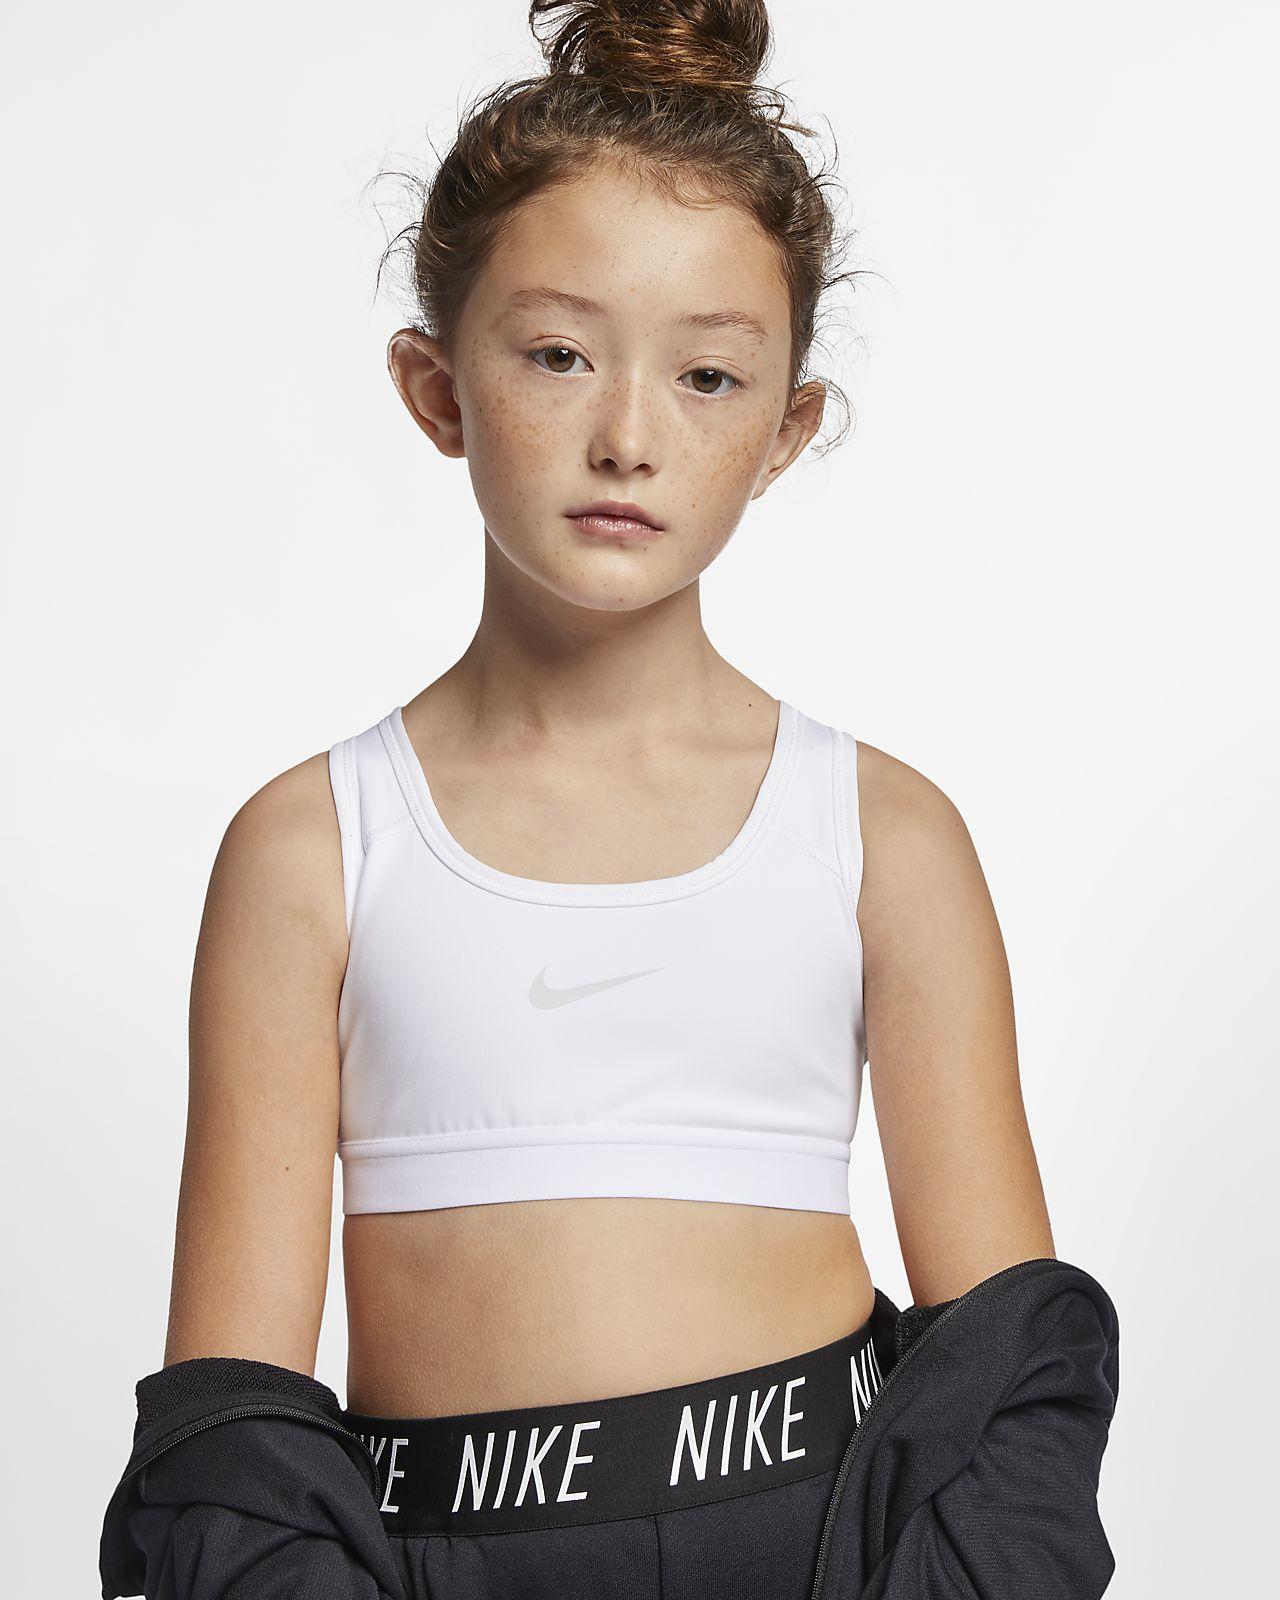 Bra Nike - Bambina/Ragazza